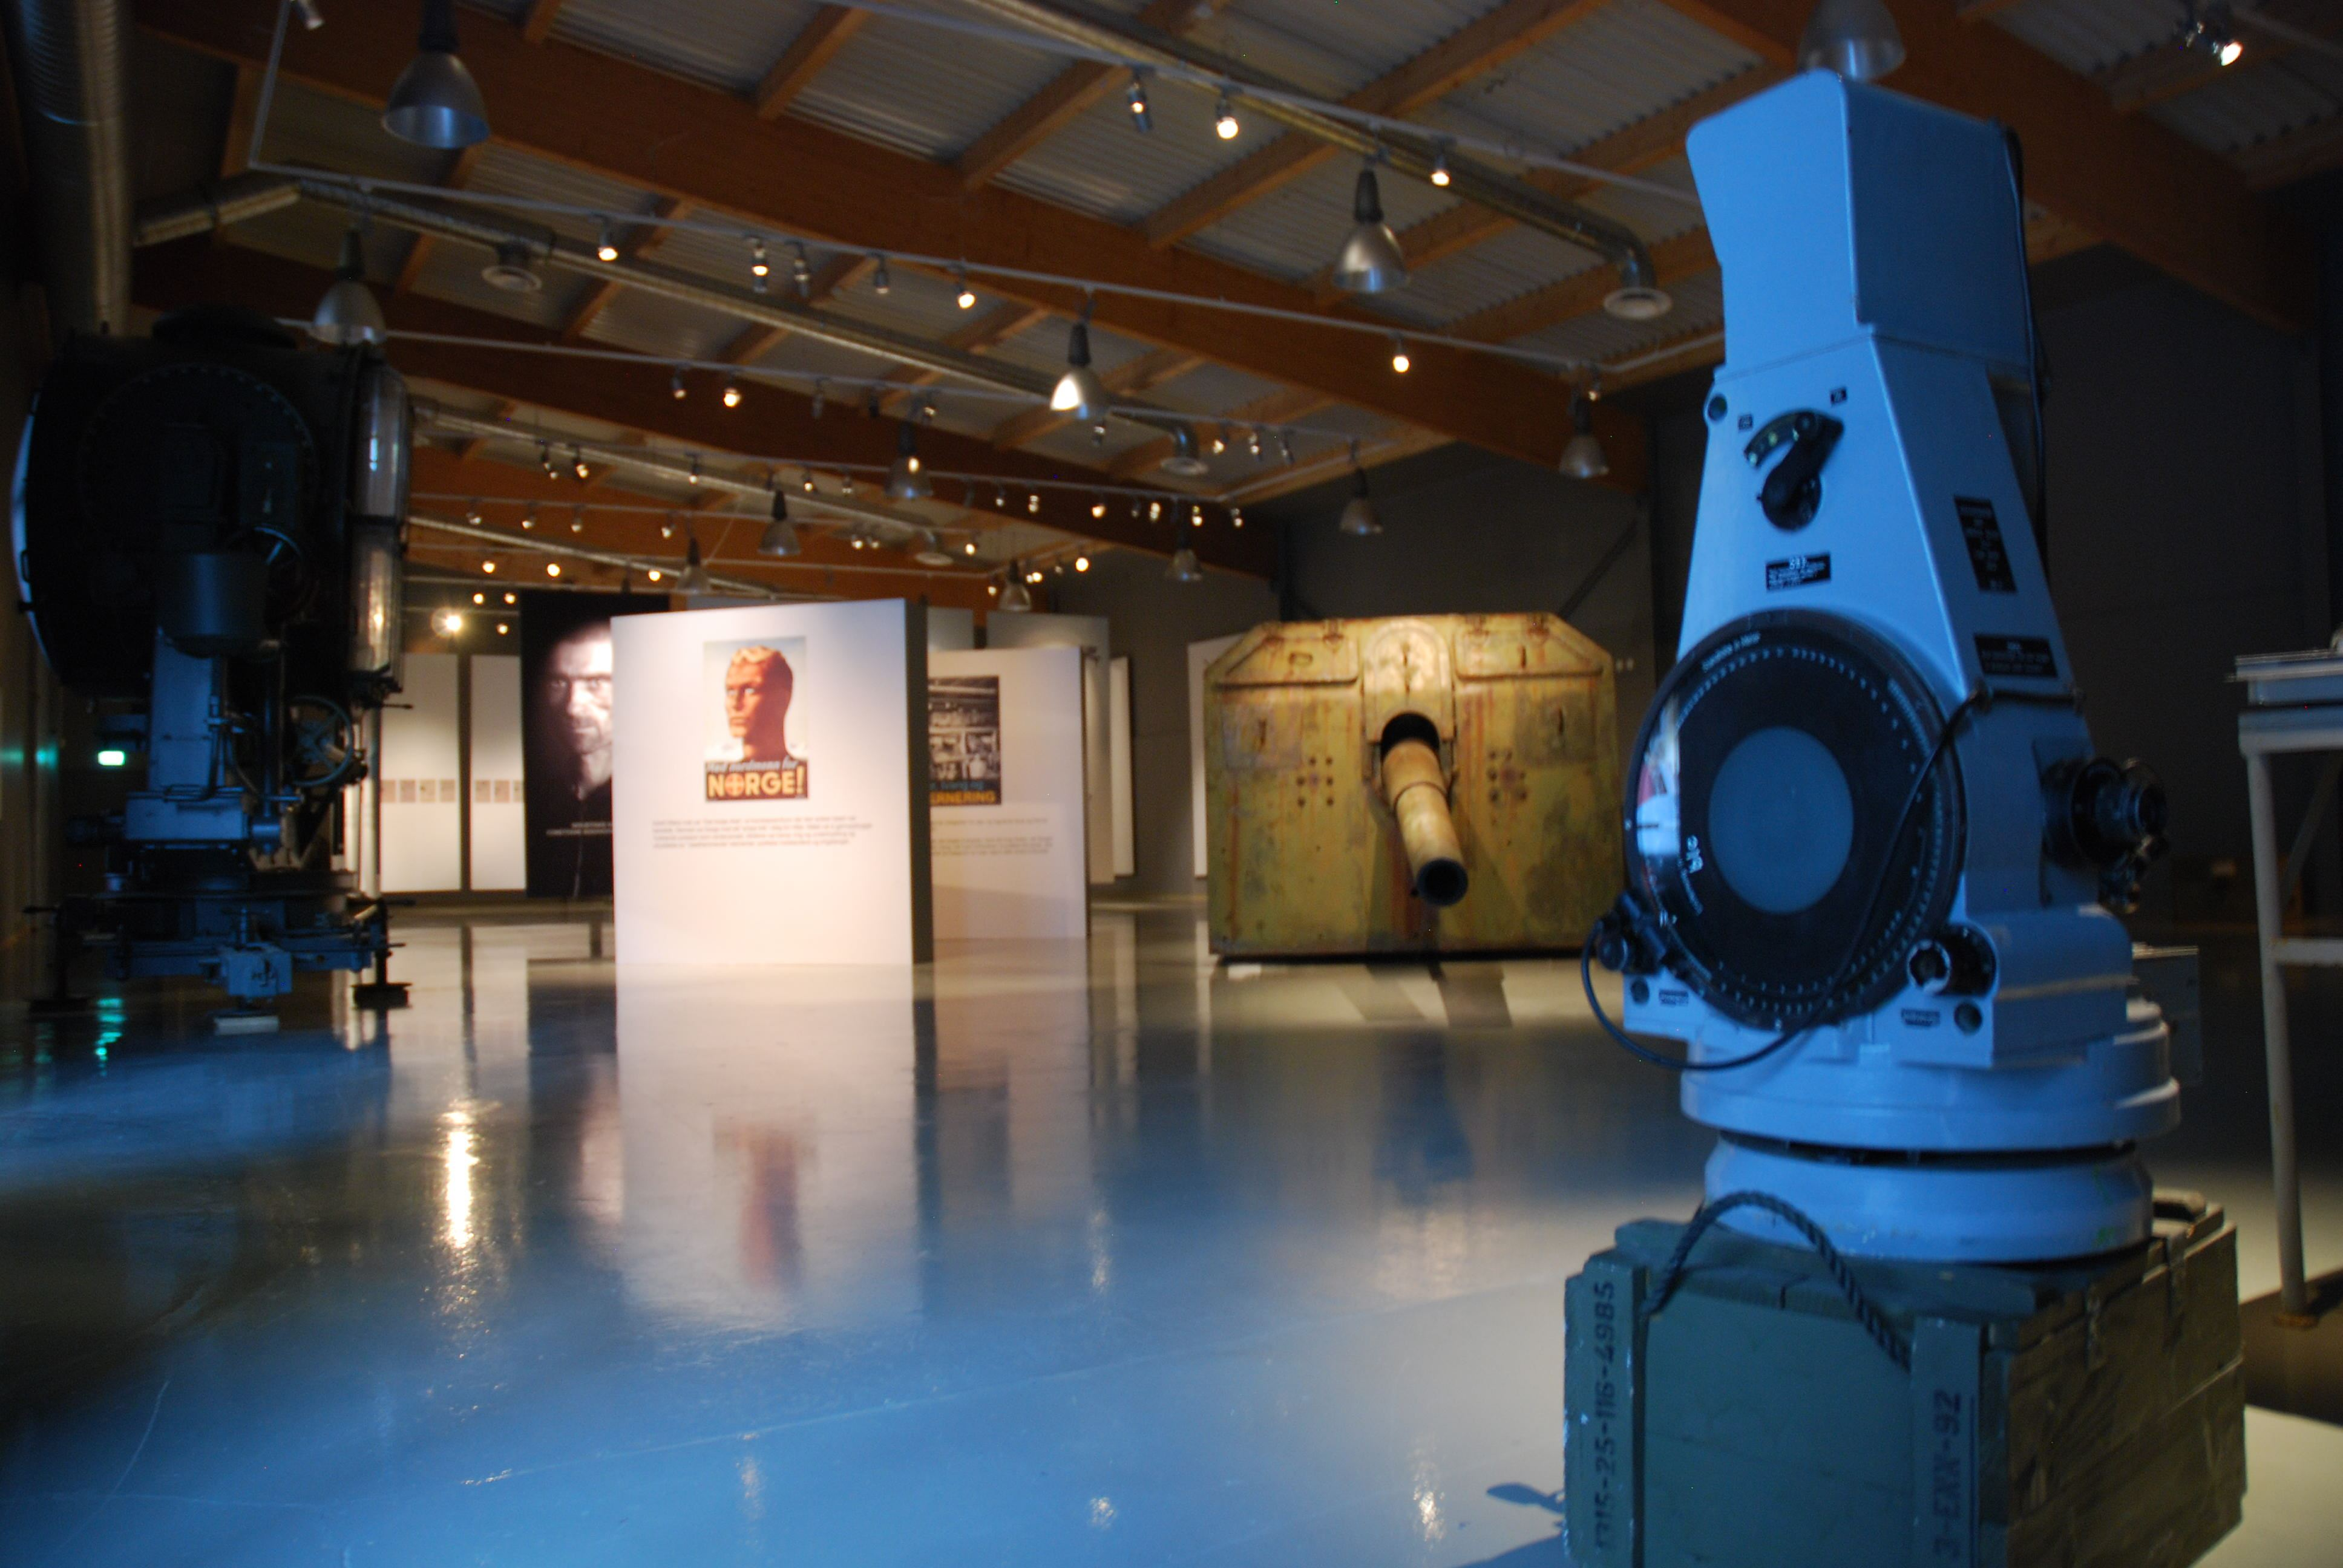 Helgeland Museum avd. Lurøy - Grønsvik Kystfort